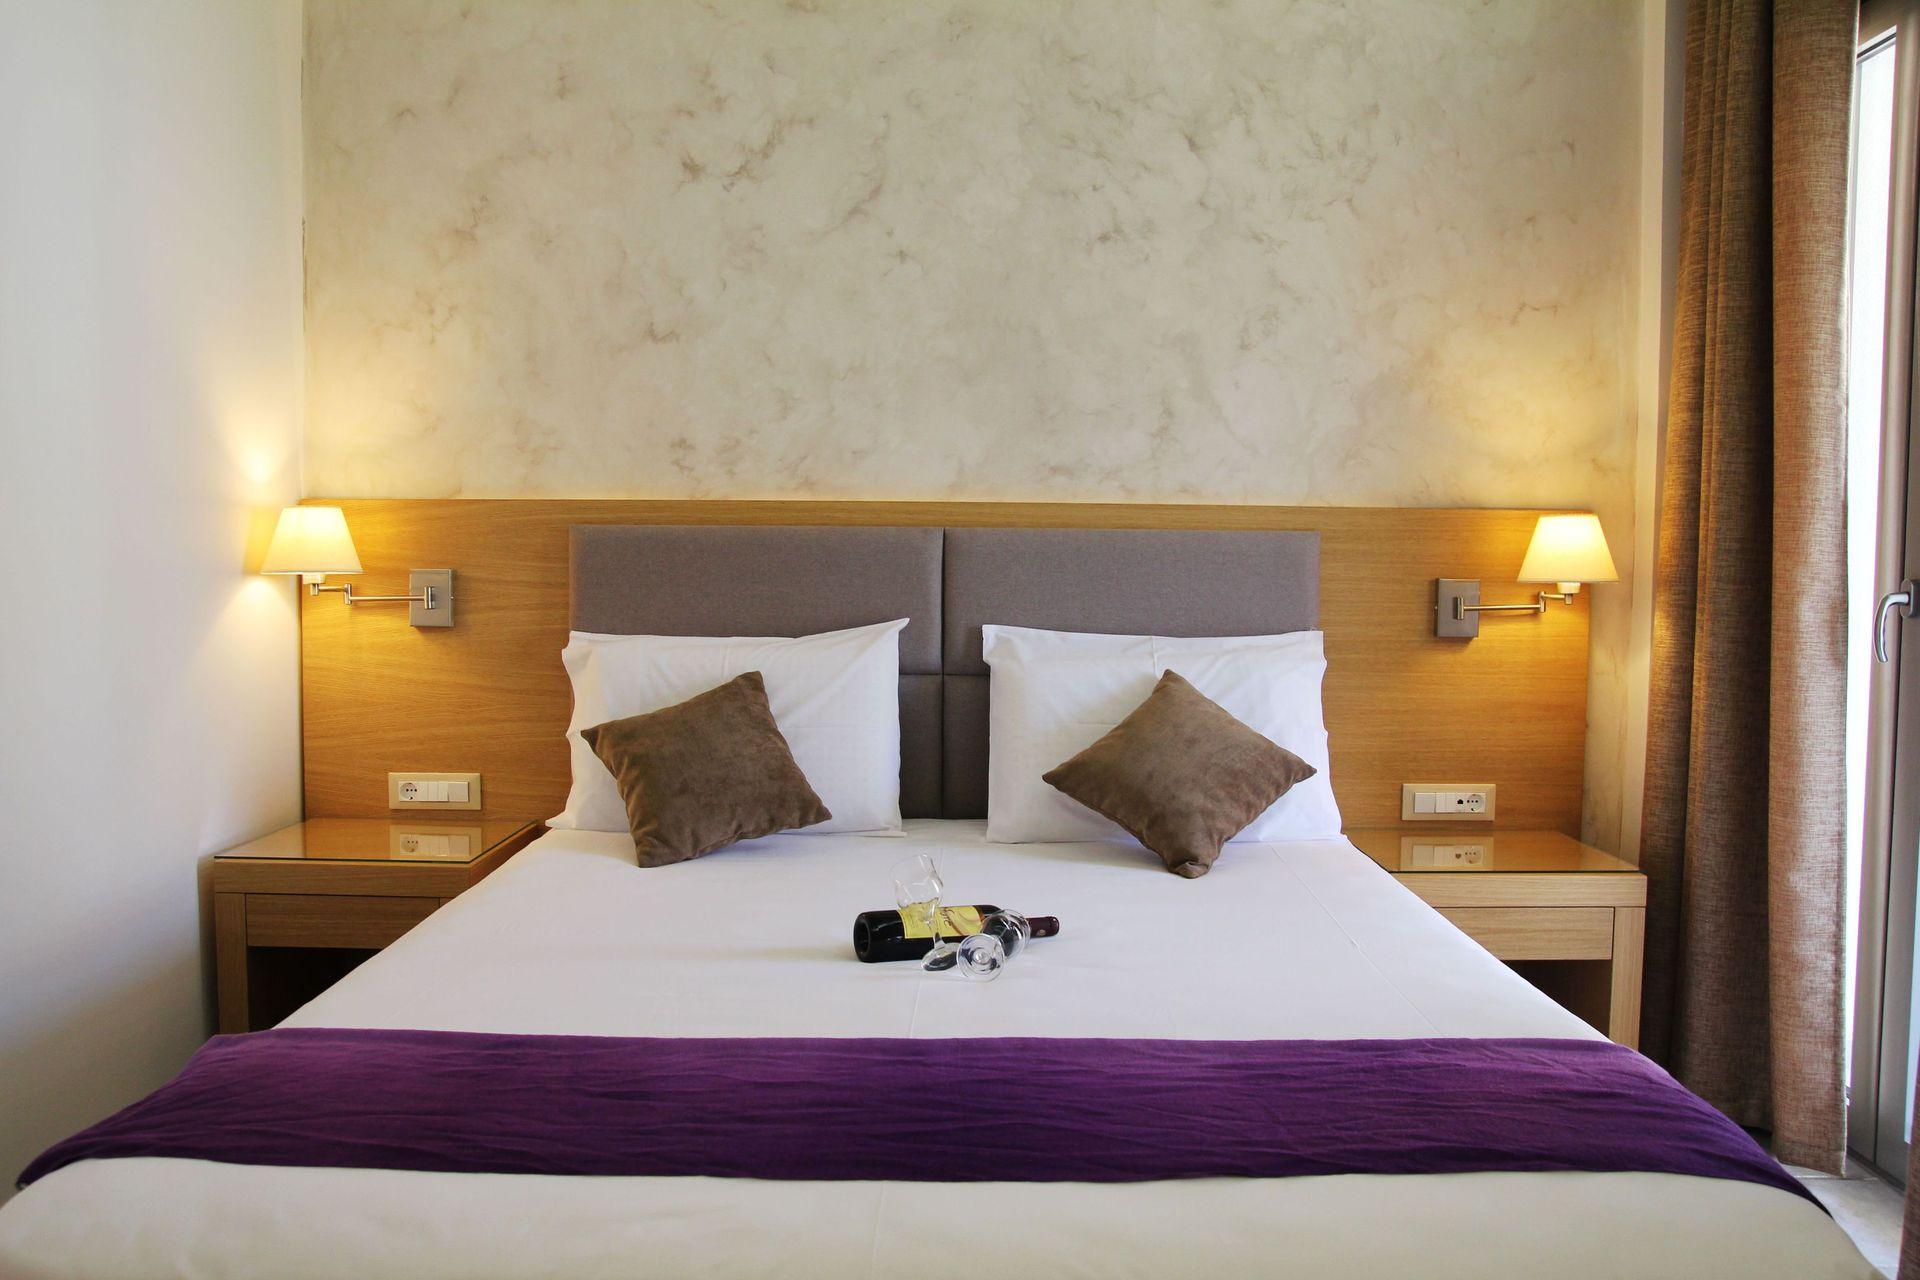 Achilles Hotel Methoni - Μεθώνη, Μεσσηνία ✦ 3 Ημέρες (2 Διανυκτερεύσεις) ✦ 2 άτομα ✦ Πρωινό ✦ 01/09/2021 έως 18/09/2021 ✦ Κοντά στη παραλία!